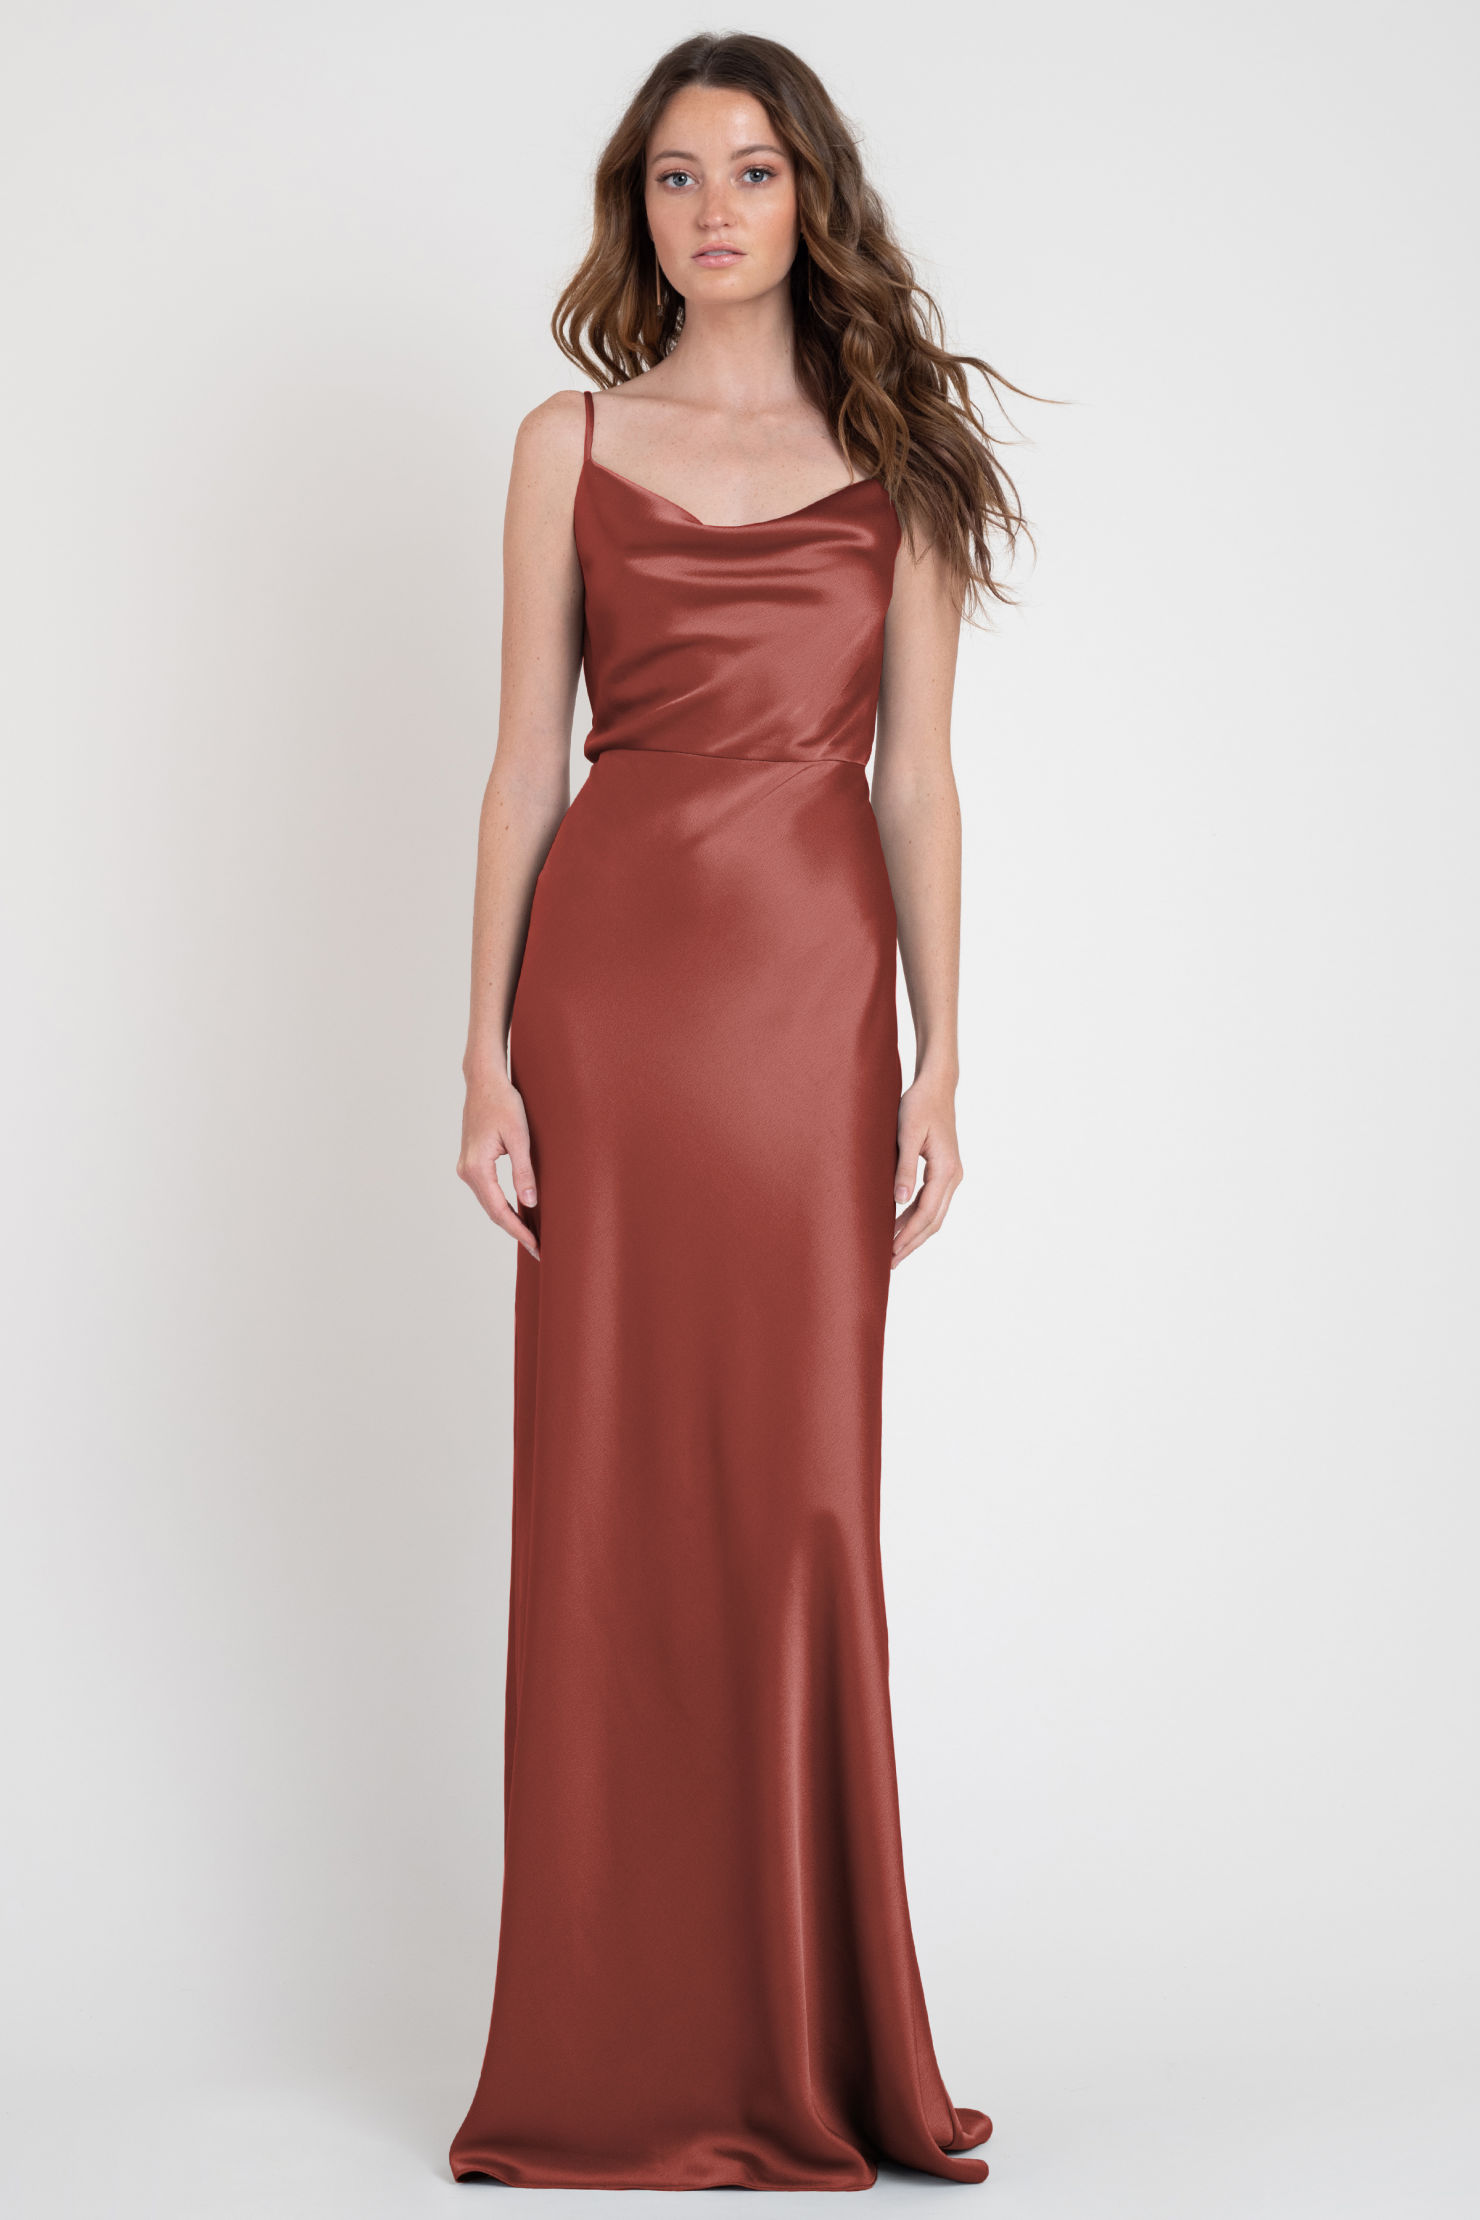 Sylvie Bridesmaids Dress by Jenny Yoo - Rust